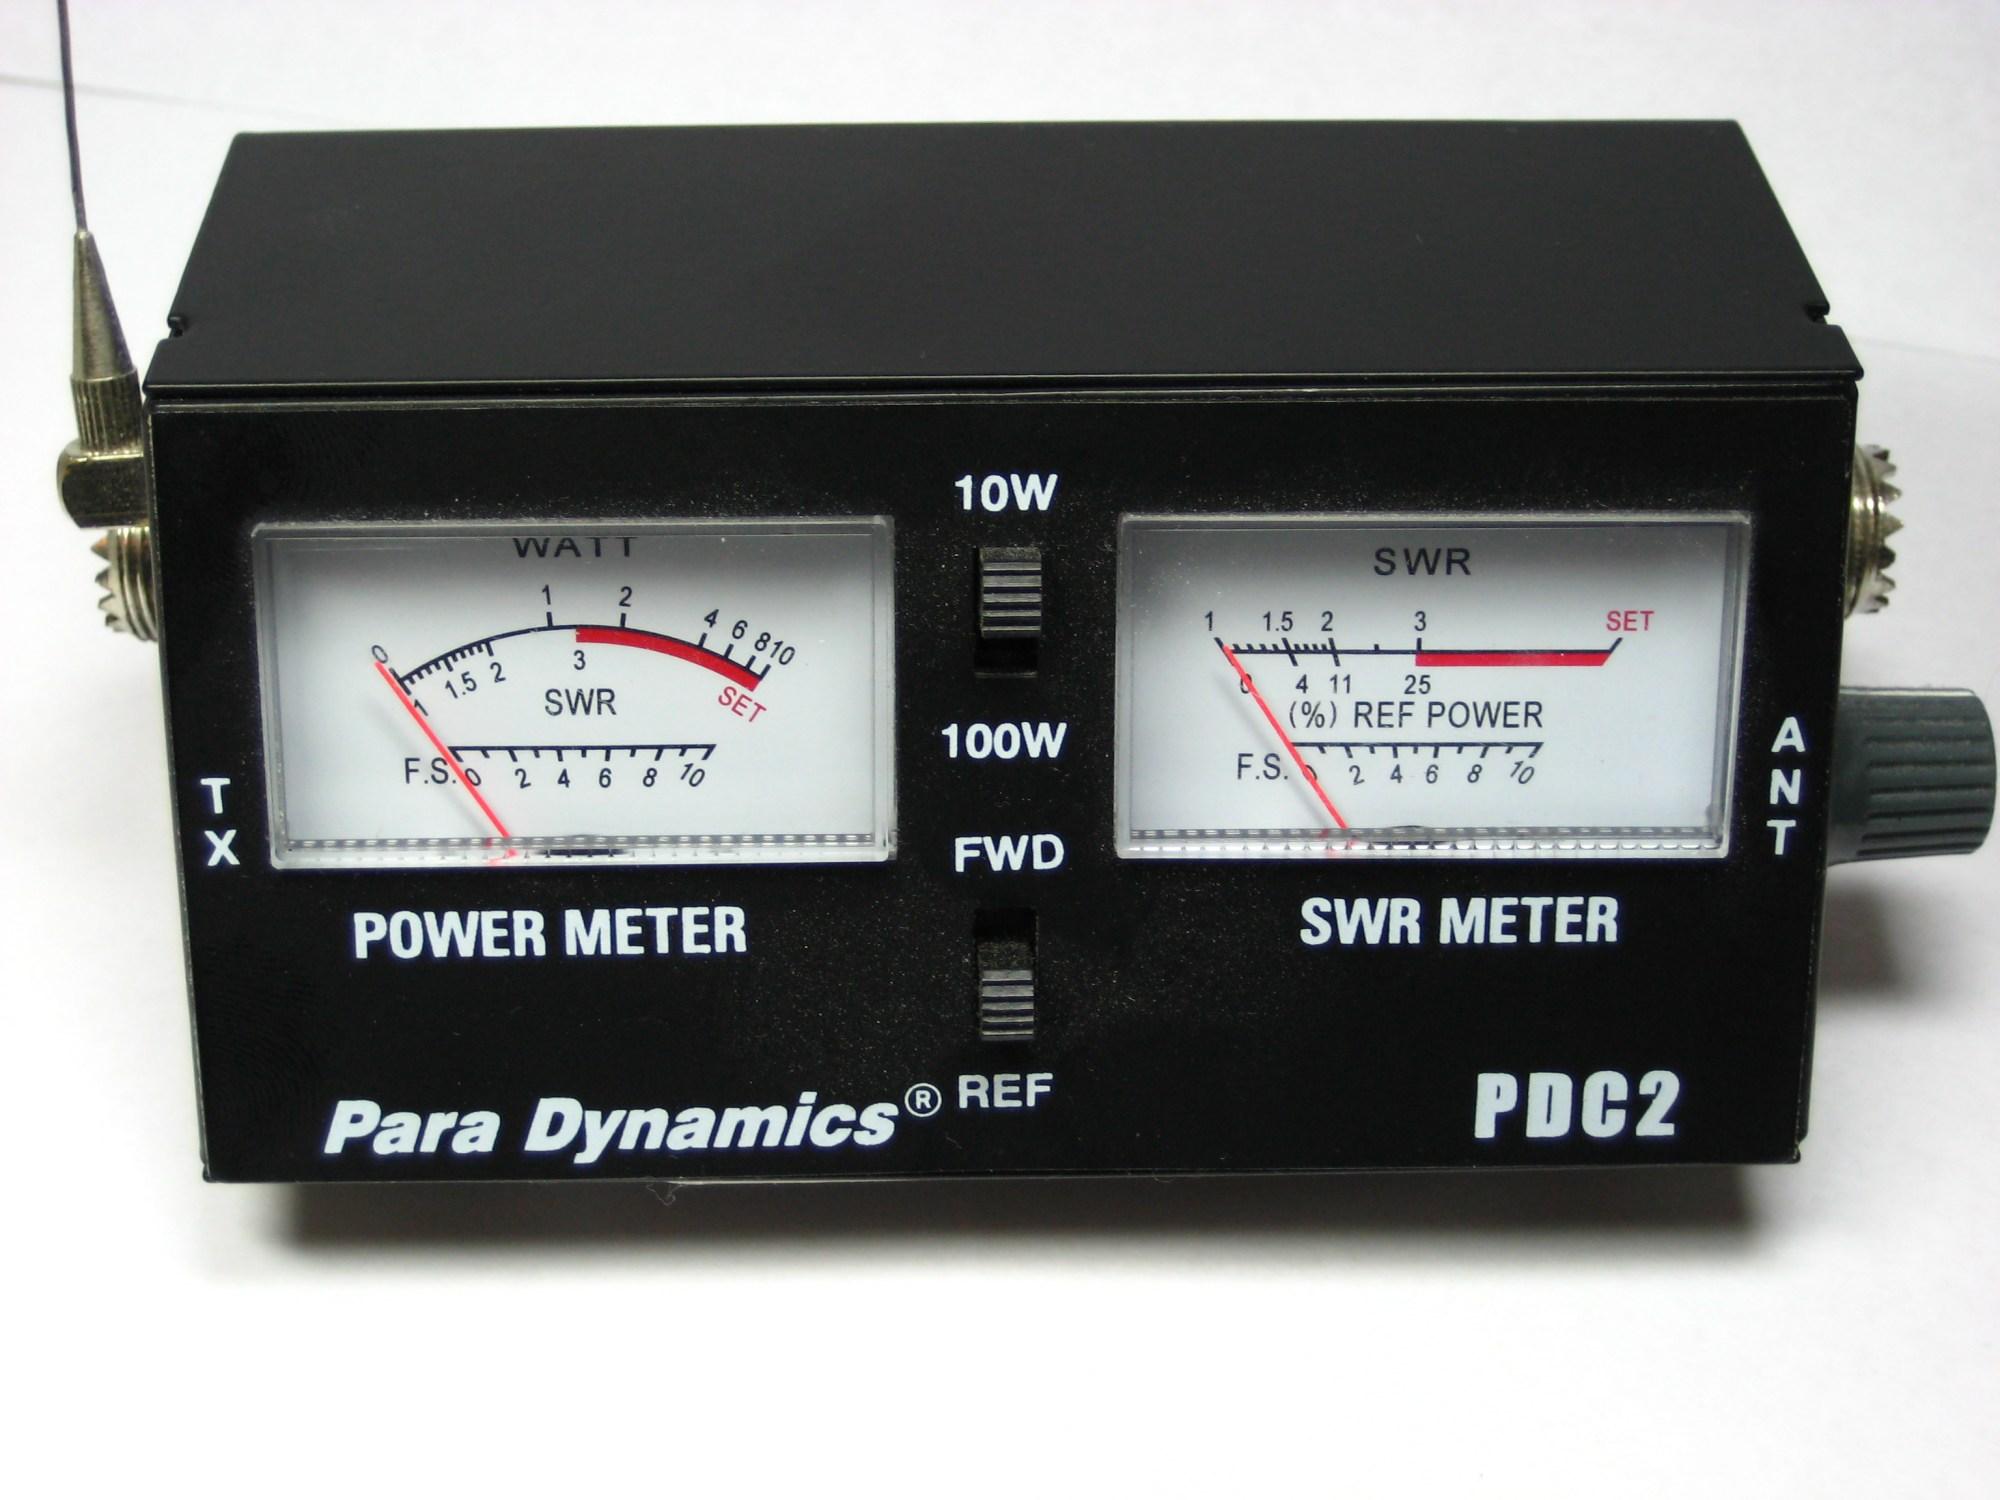 hight resolution of vector wattmeter diagram of induction